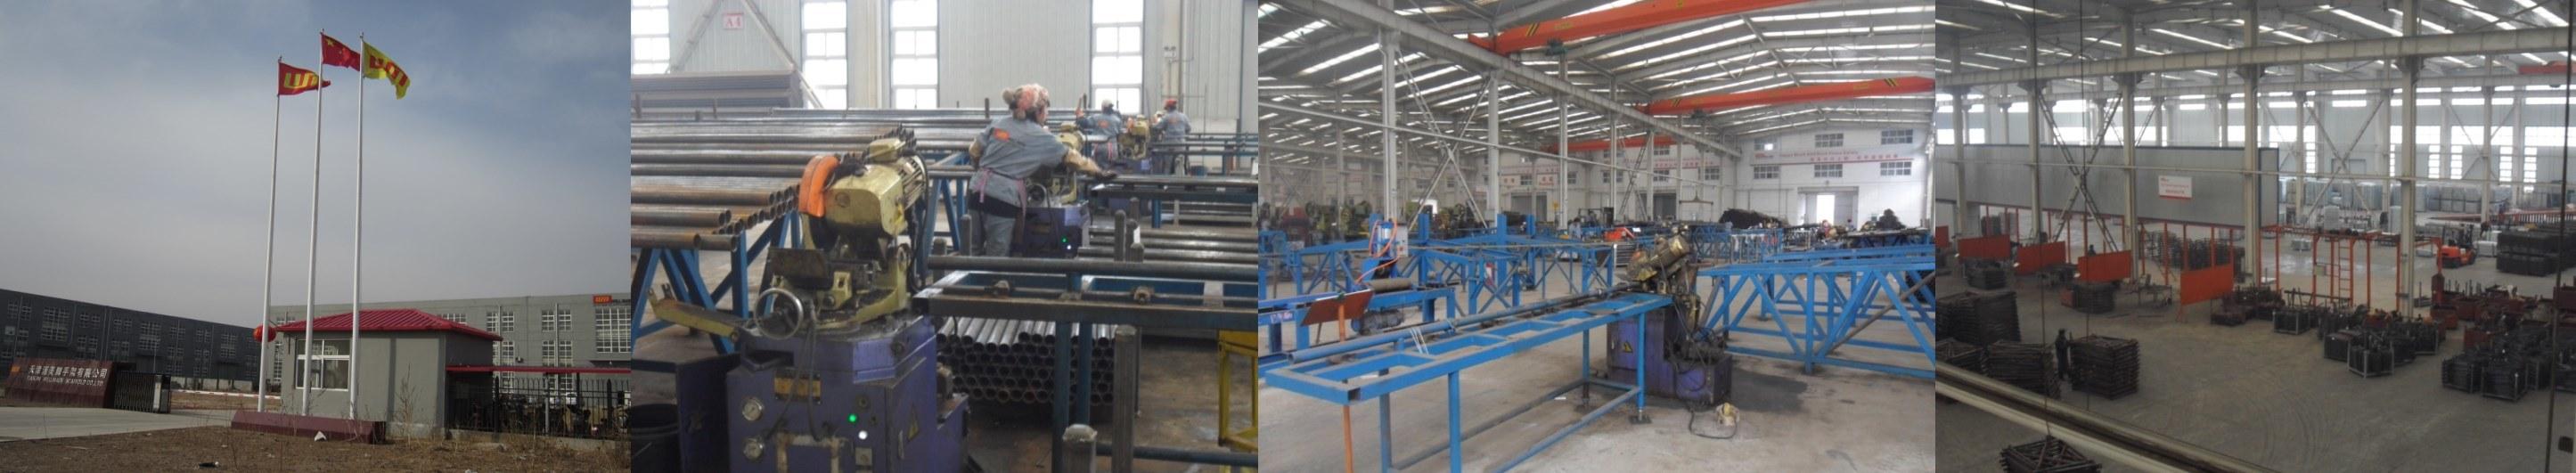 Galvanized Scaffolding Steel Planks Supply to Kuwait Knpc (225X38mm)